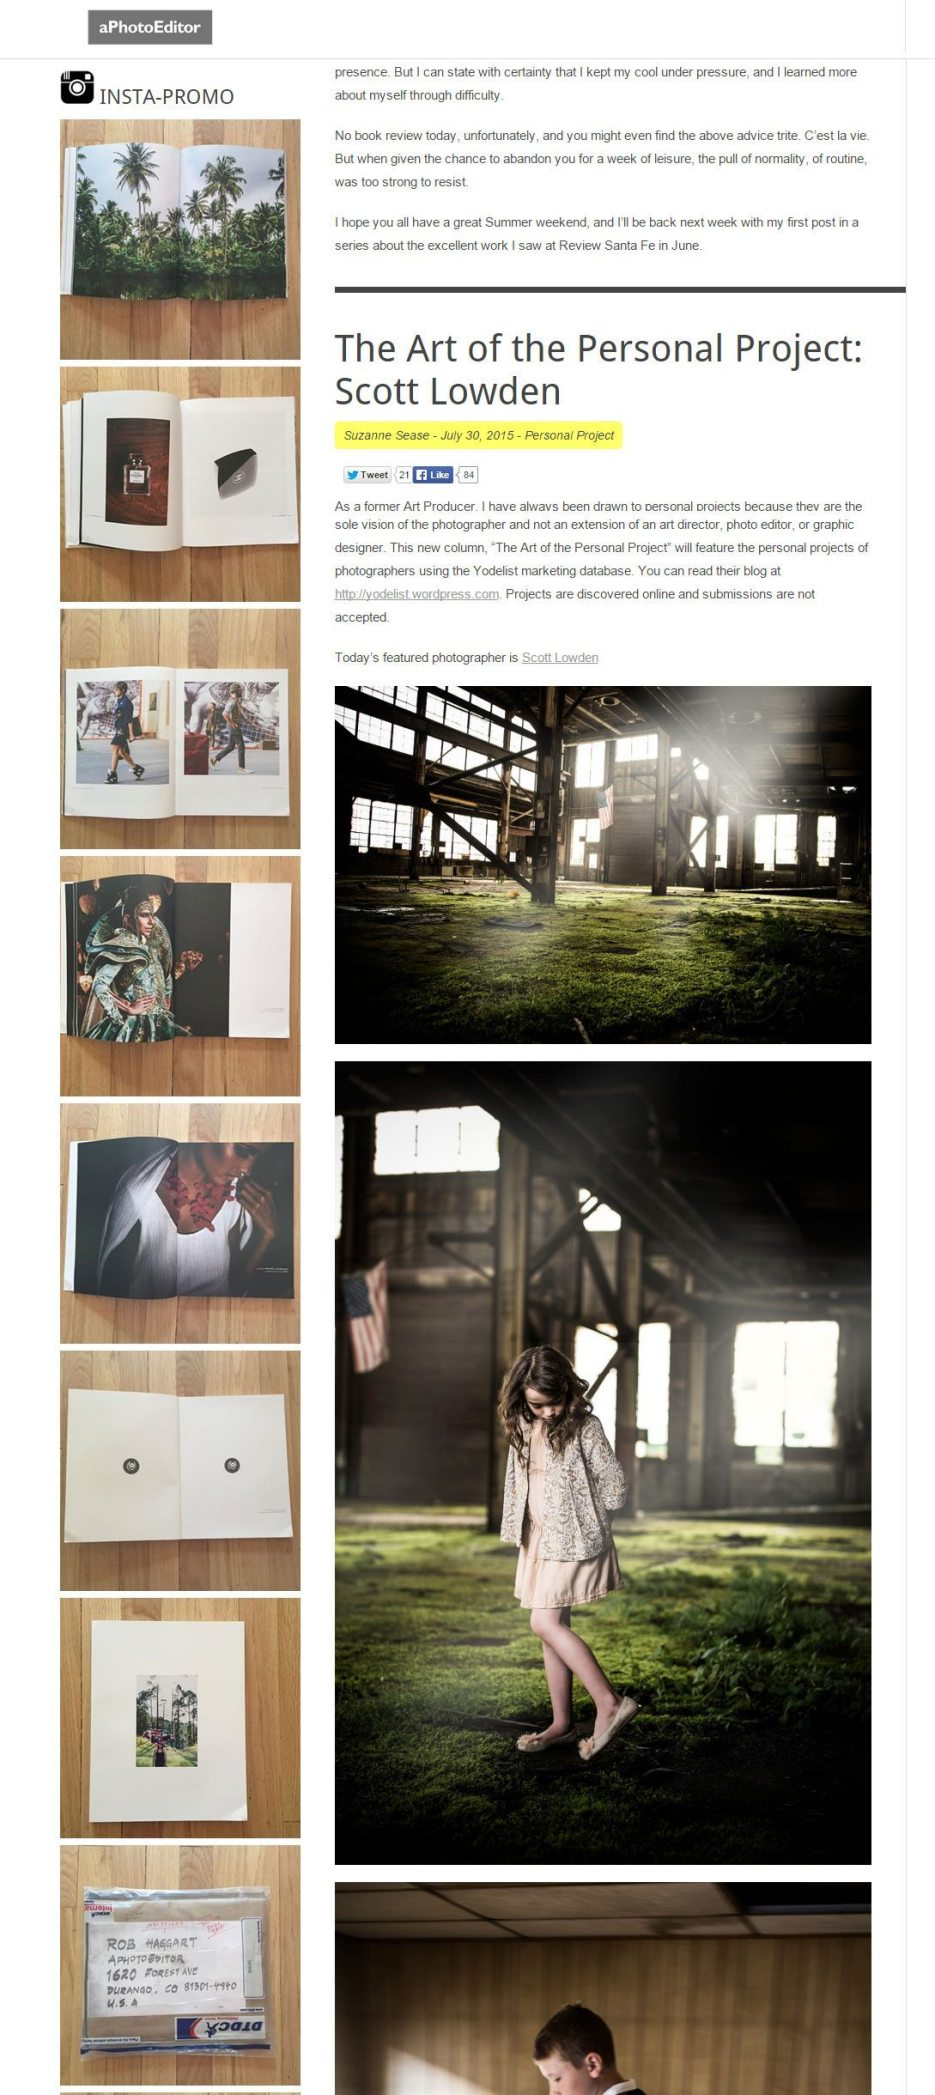 Photography Portfolio Book, Rob Haggart, aphotoeditor, Naina.co Luxury & Lifestyle, Photographer Storyteller, Blogger.